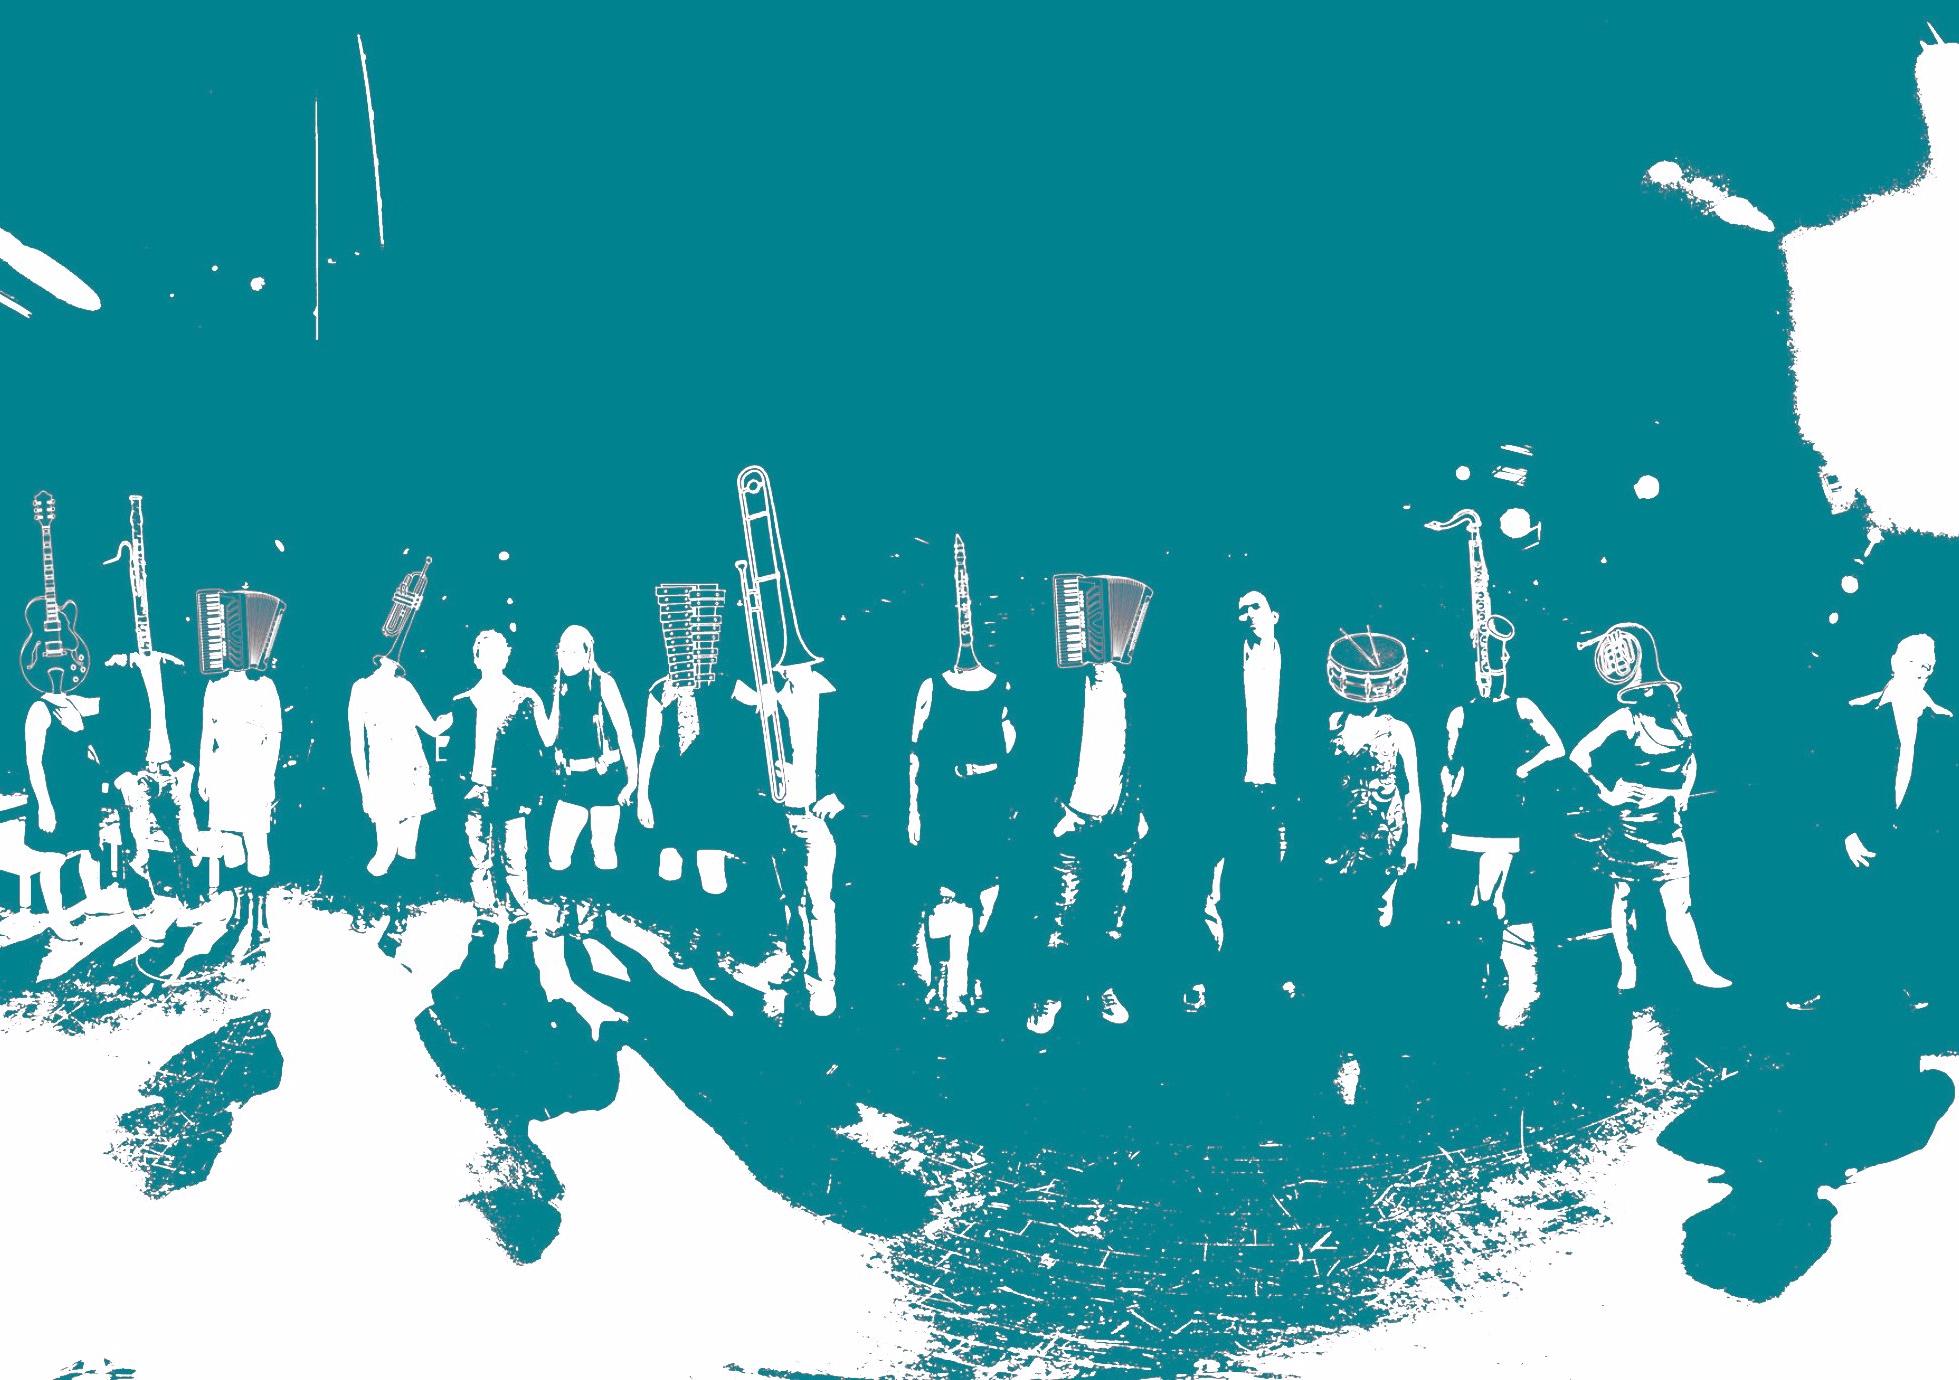 Syncopes orchestrales a cappella ce vendredi 9 et dimanche 11 juin 2017